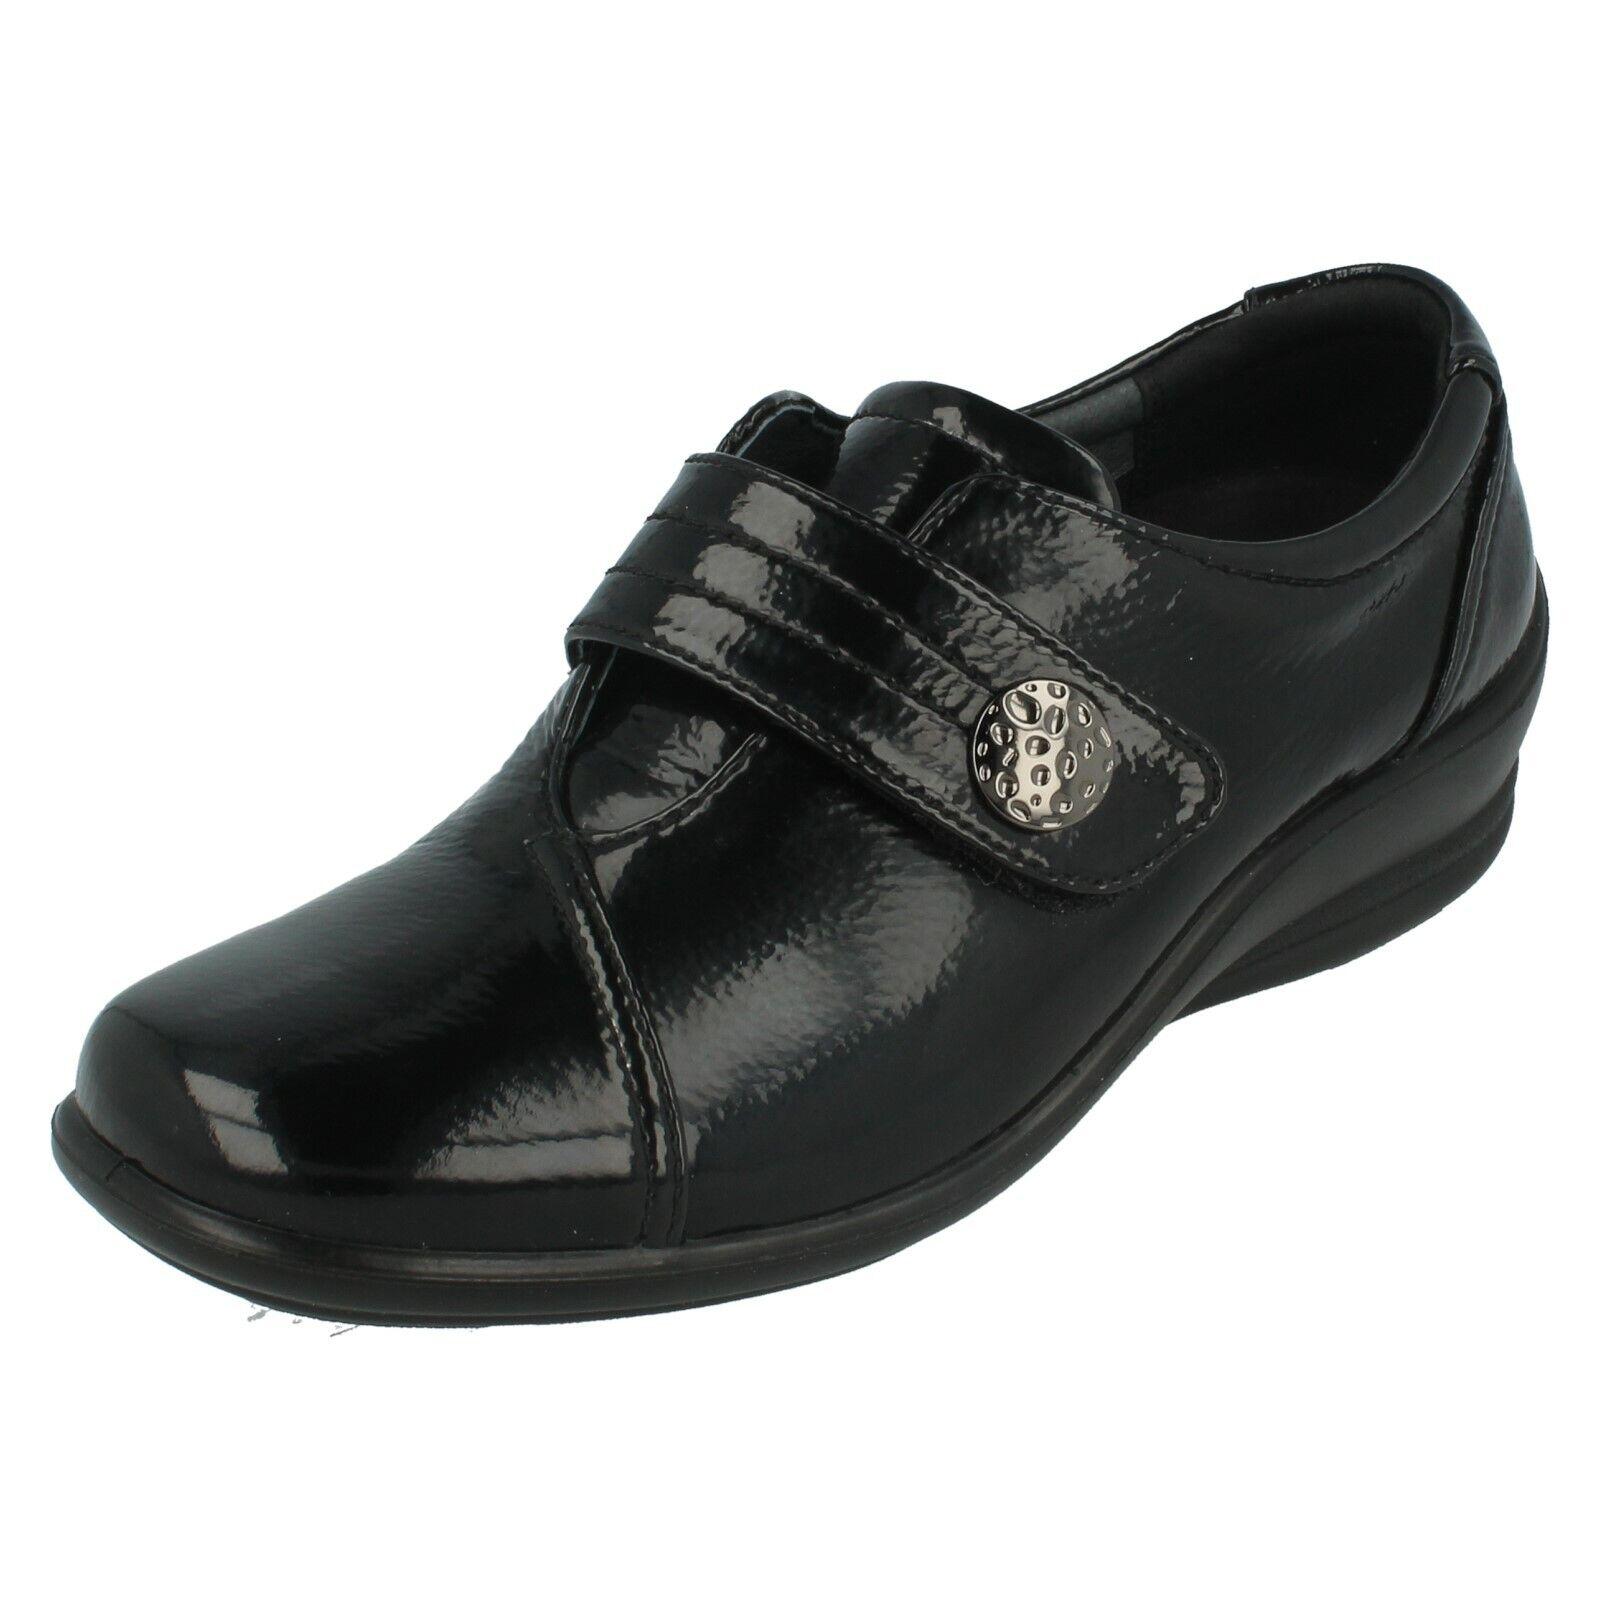 Ladies Padders Black Patent Hook & Loop Strap Flat shoes SIMONE E EE Fit